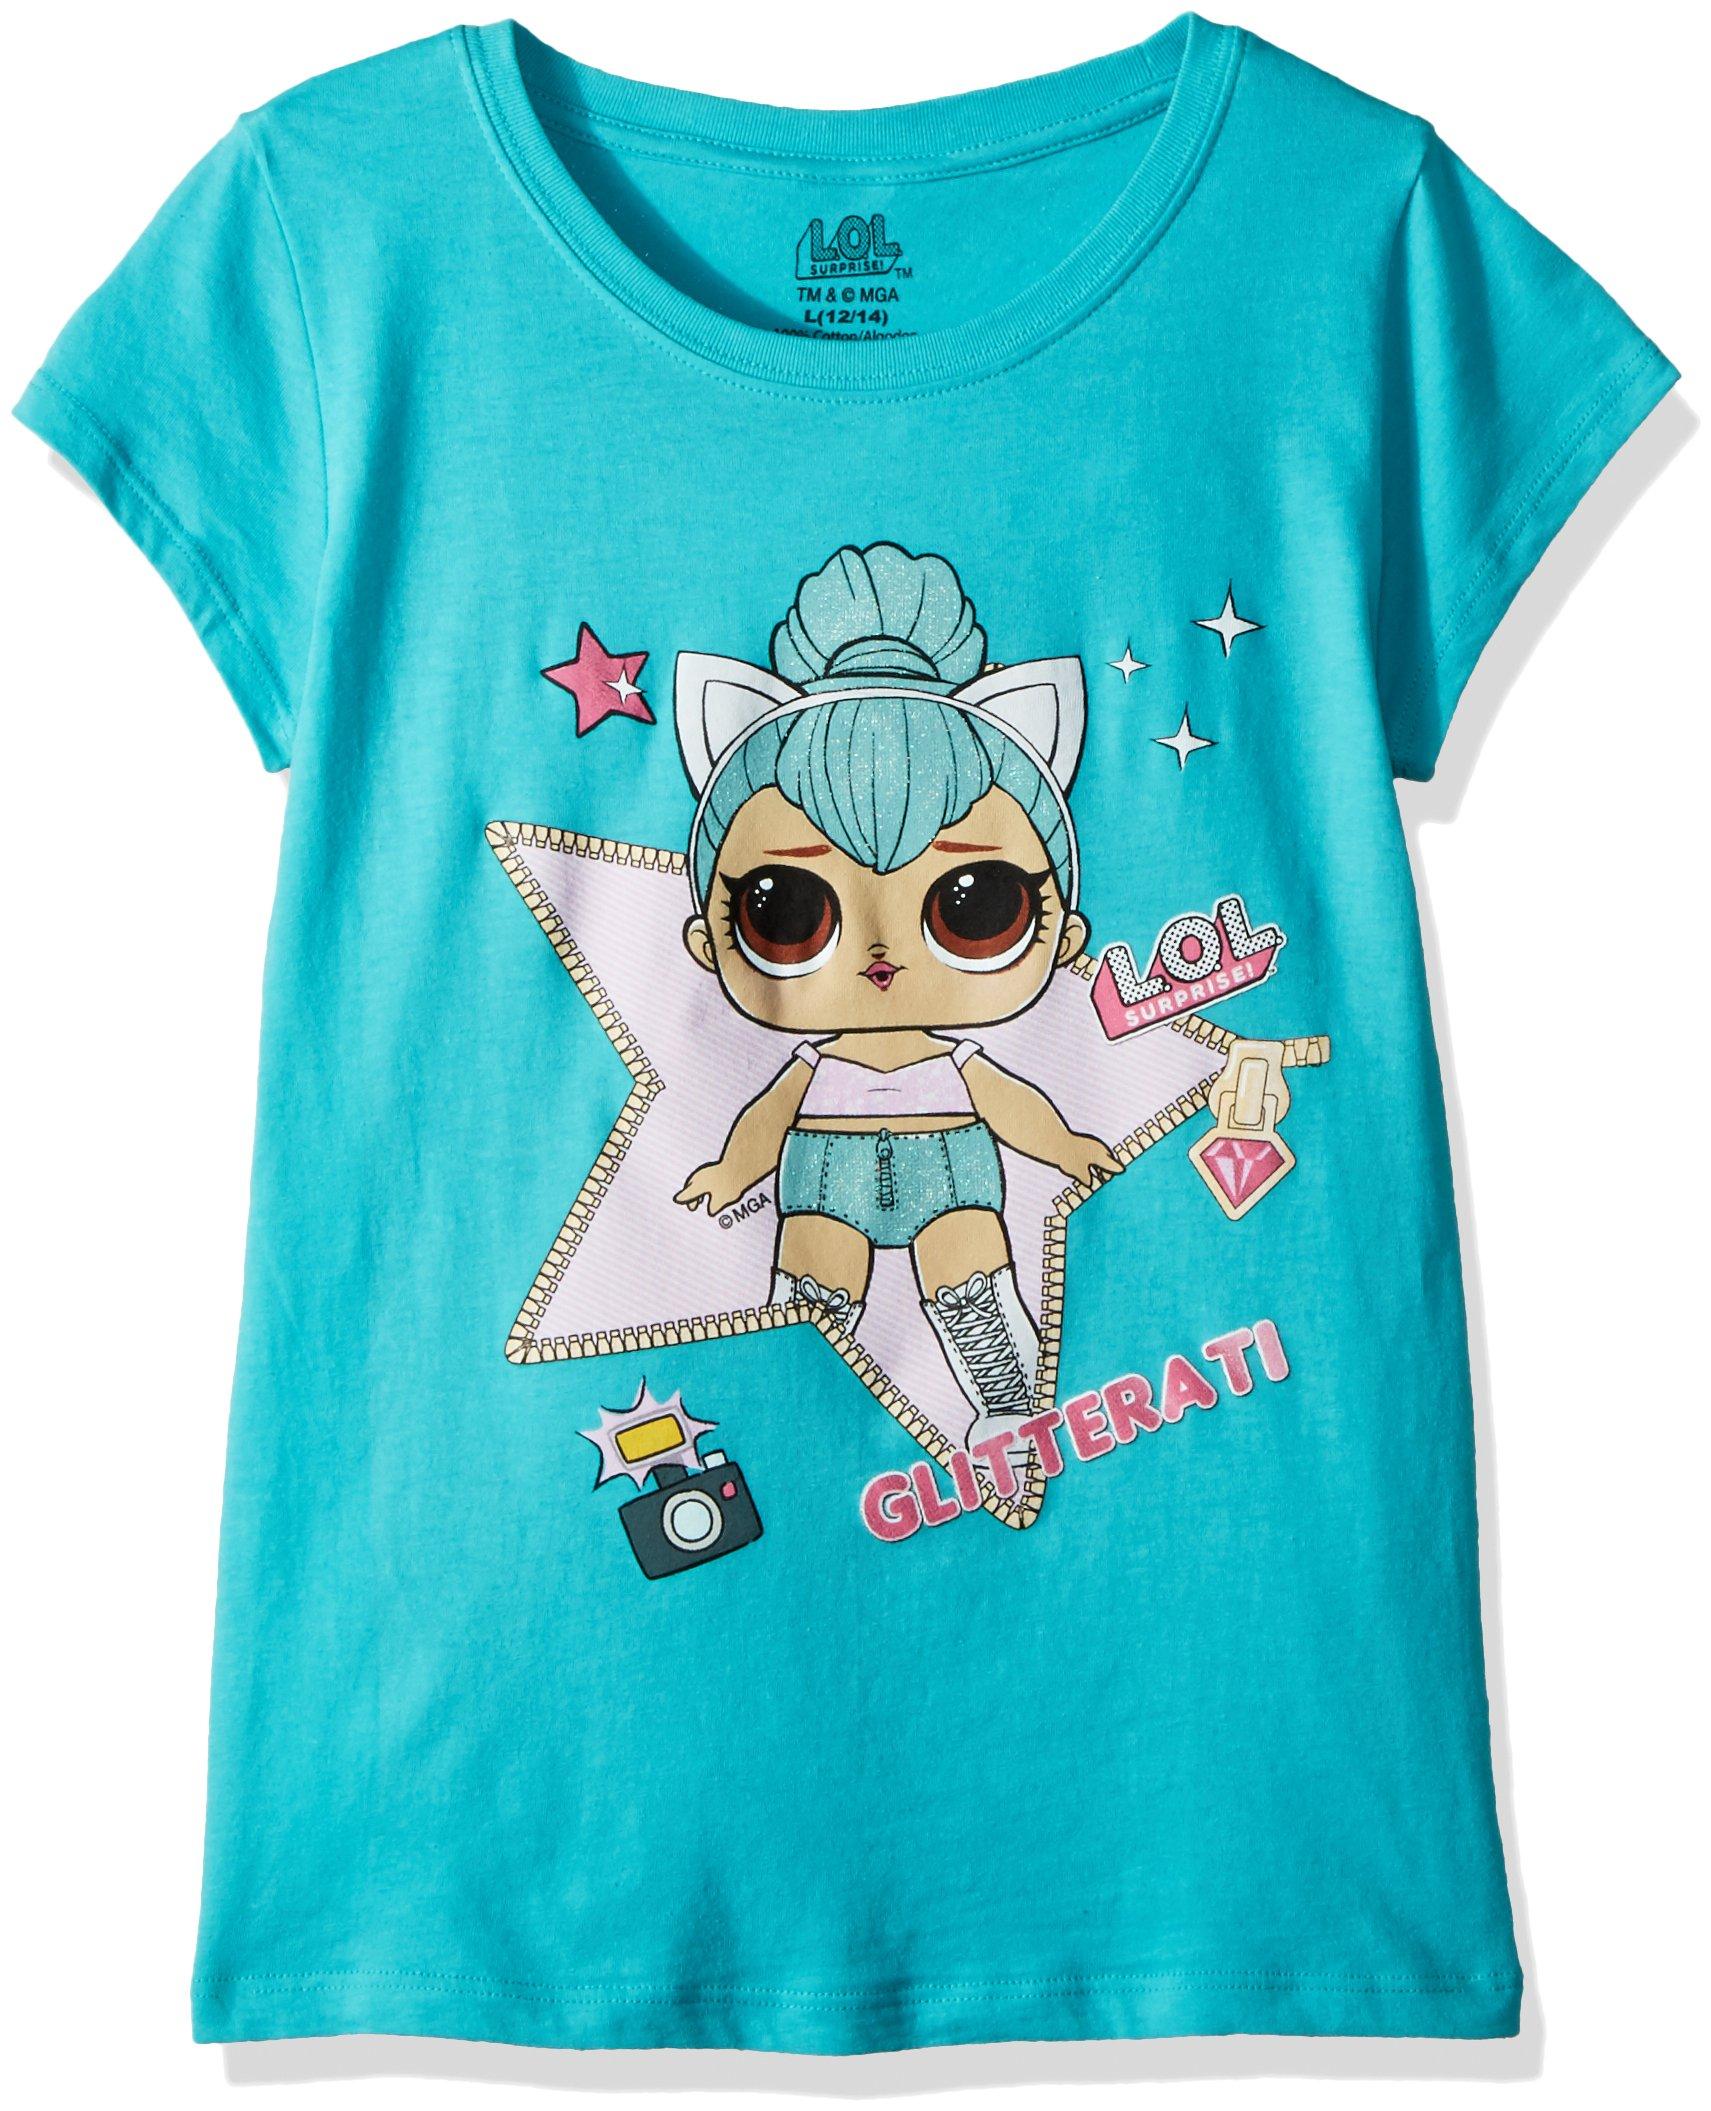 L.O.L. Surprise! Little Girls' The Glitterati Kitty Queen Short Sleeve T-Shirt, Tahiti Blue, M-5/6